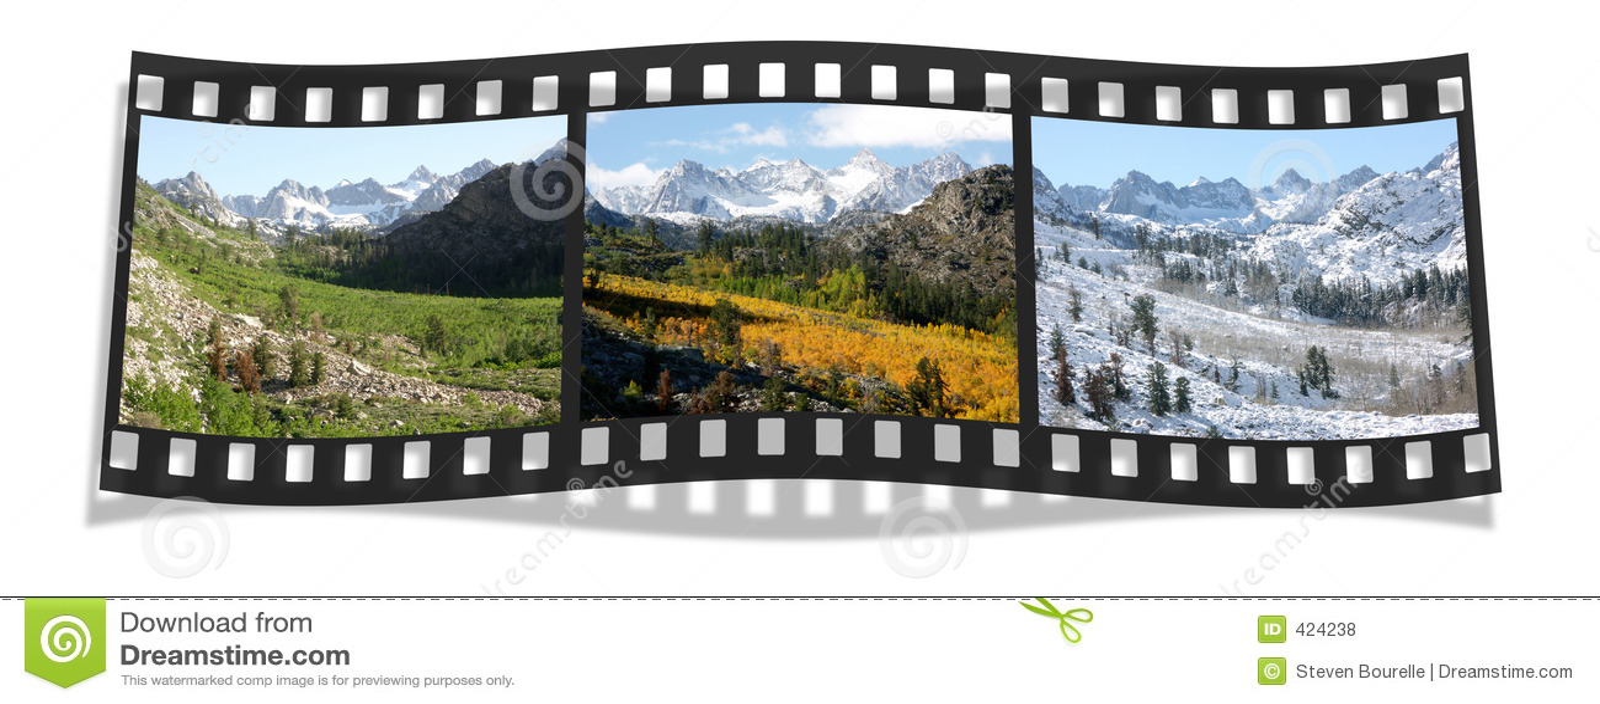 3 Seasons Film Strip